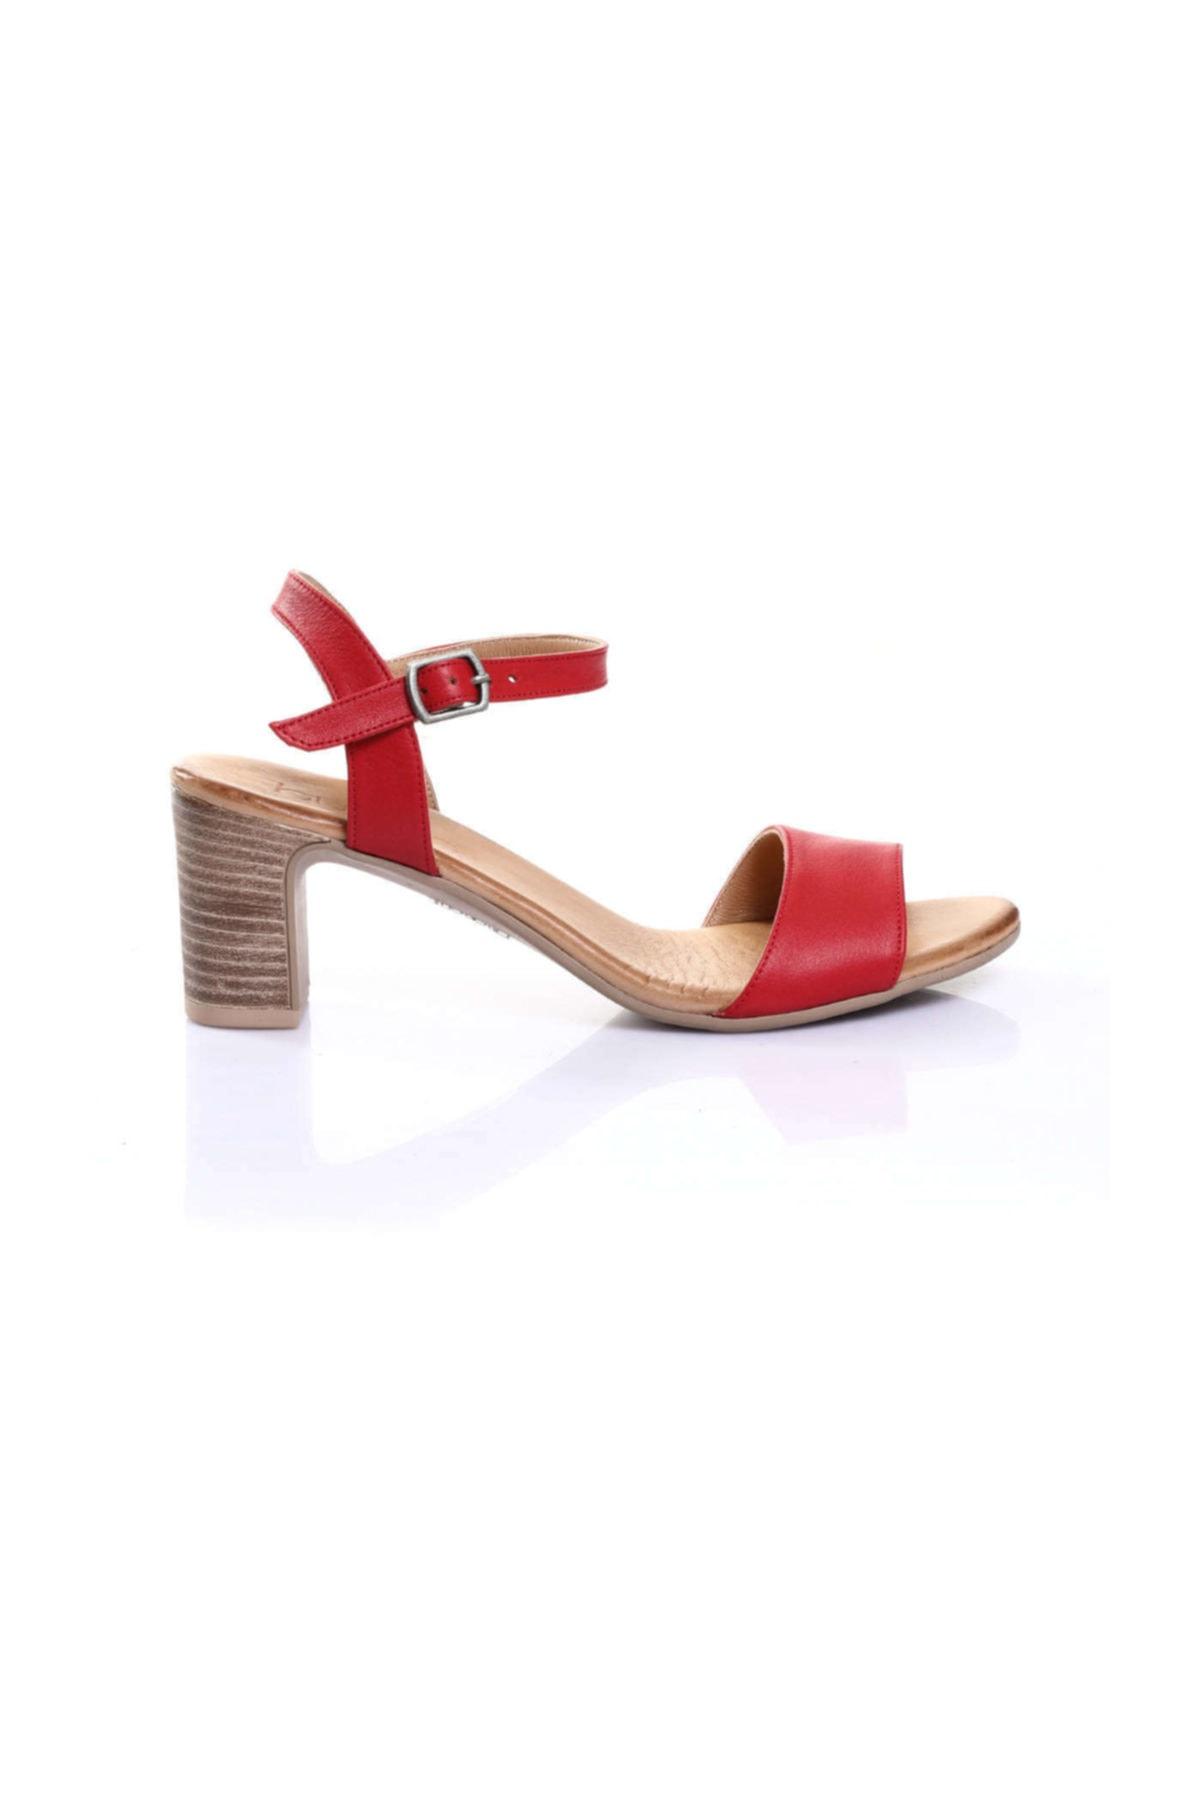 BUENO Shoes Siyah Kadın Sandalet 9n1506 1